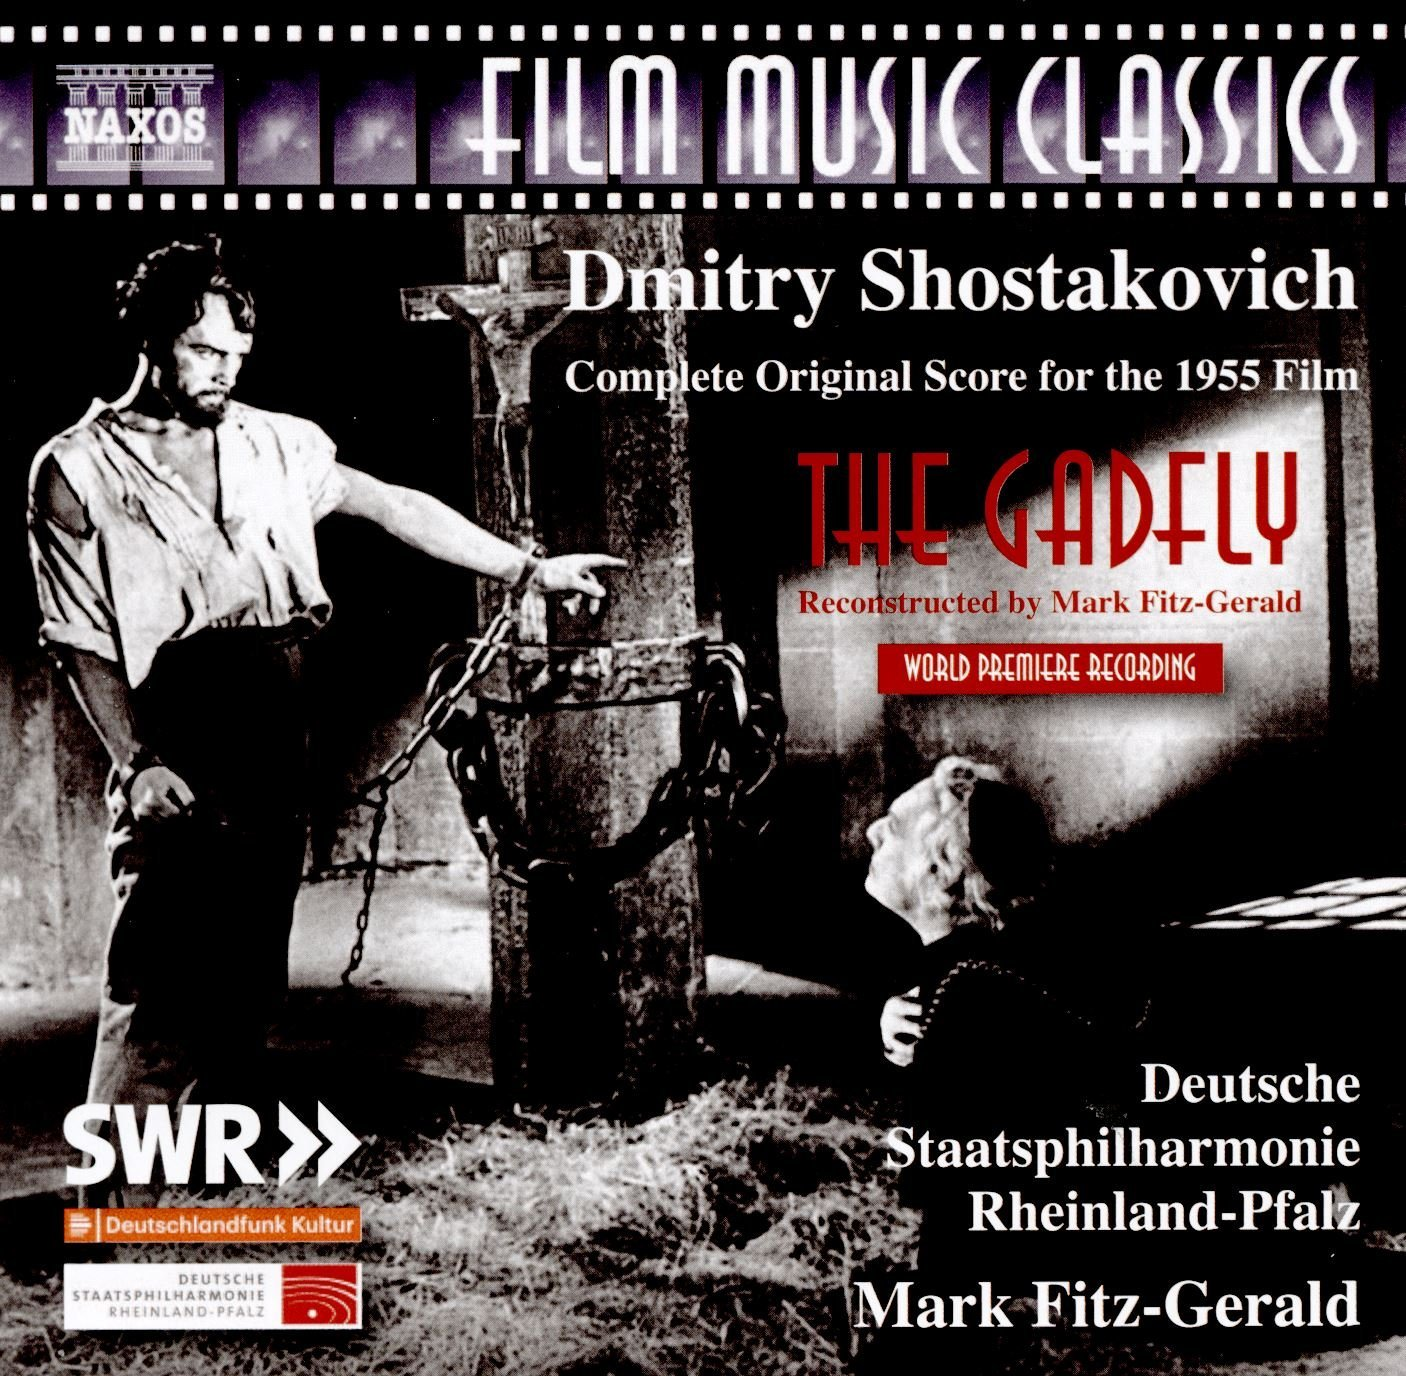 Shostakovich classic fm dating